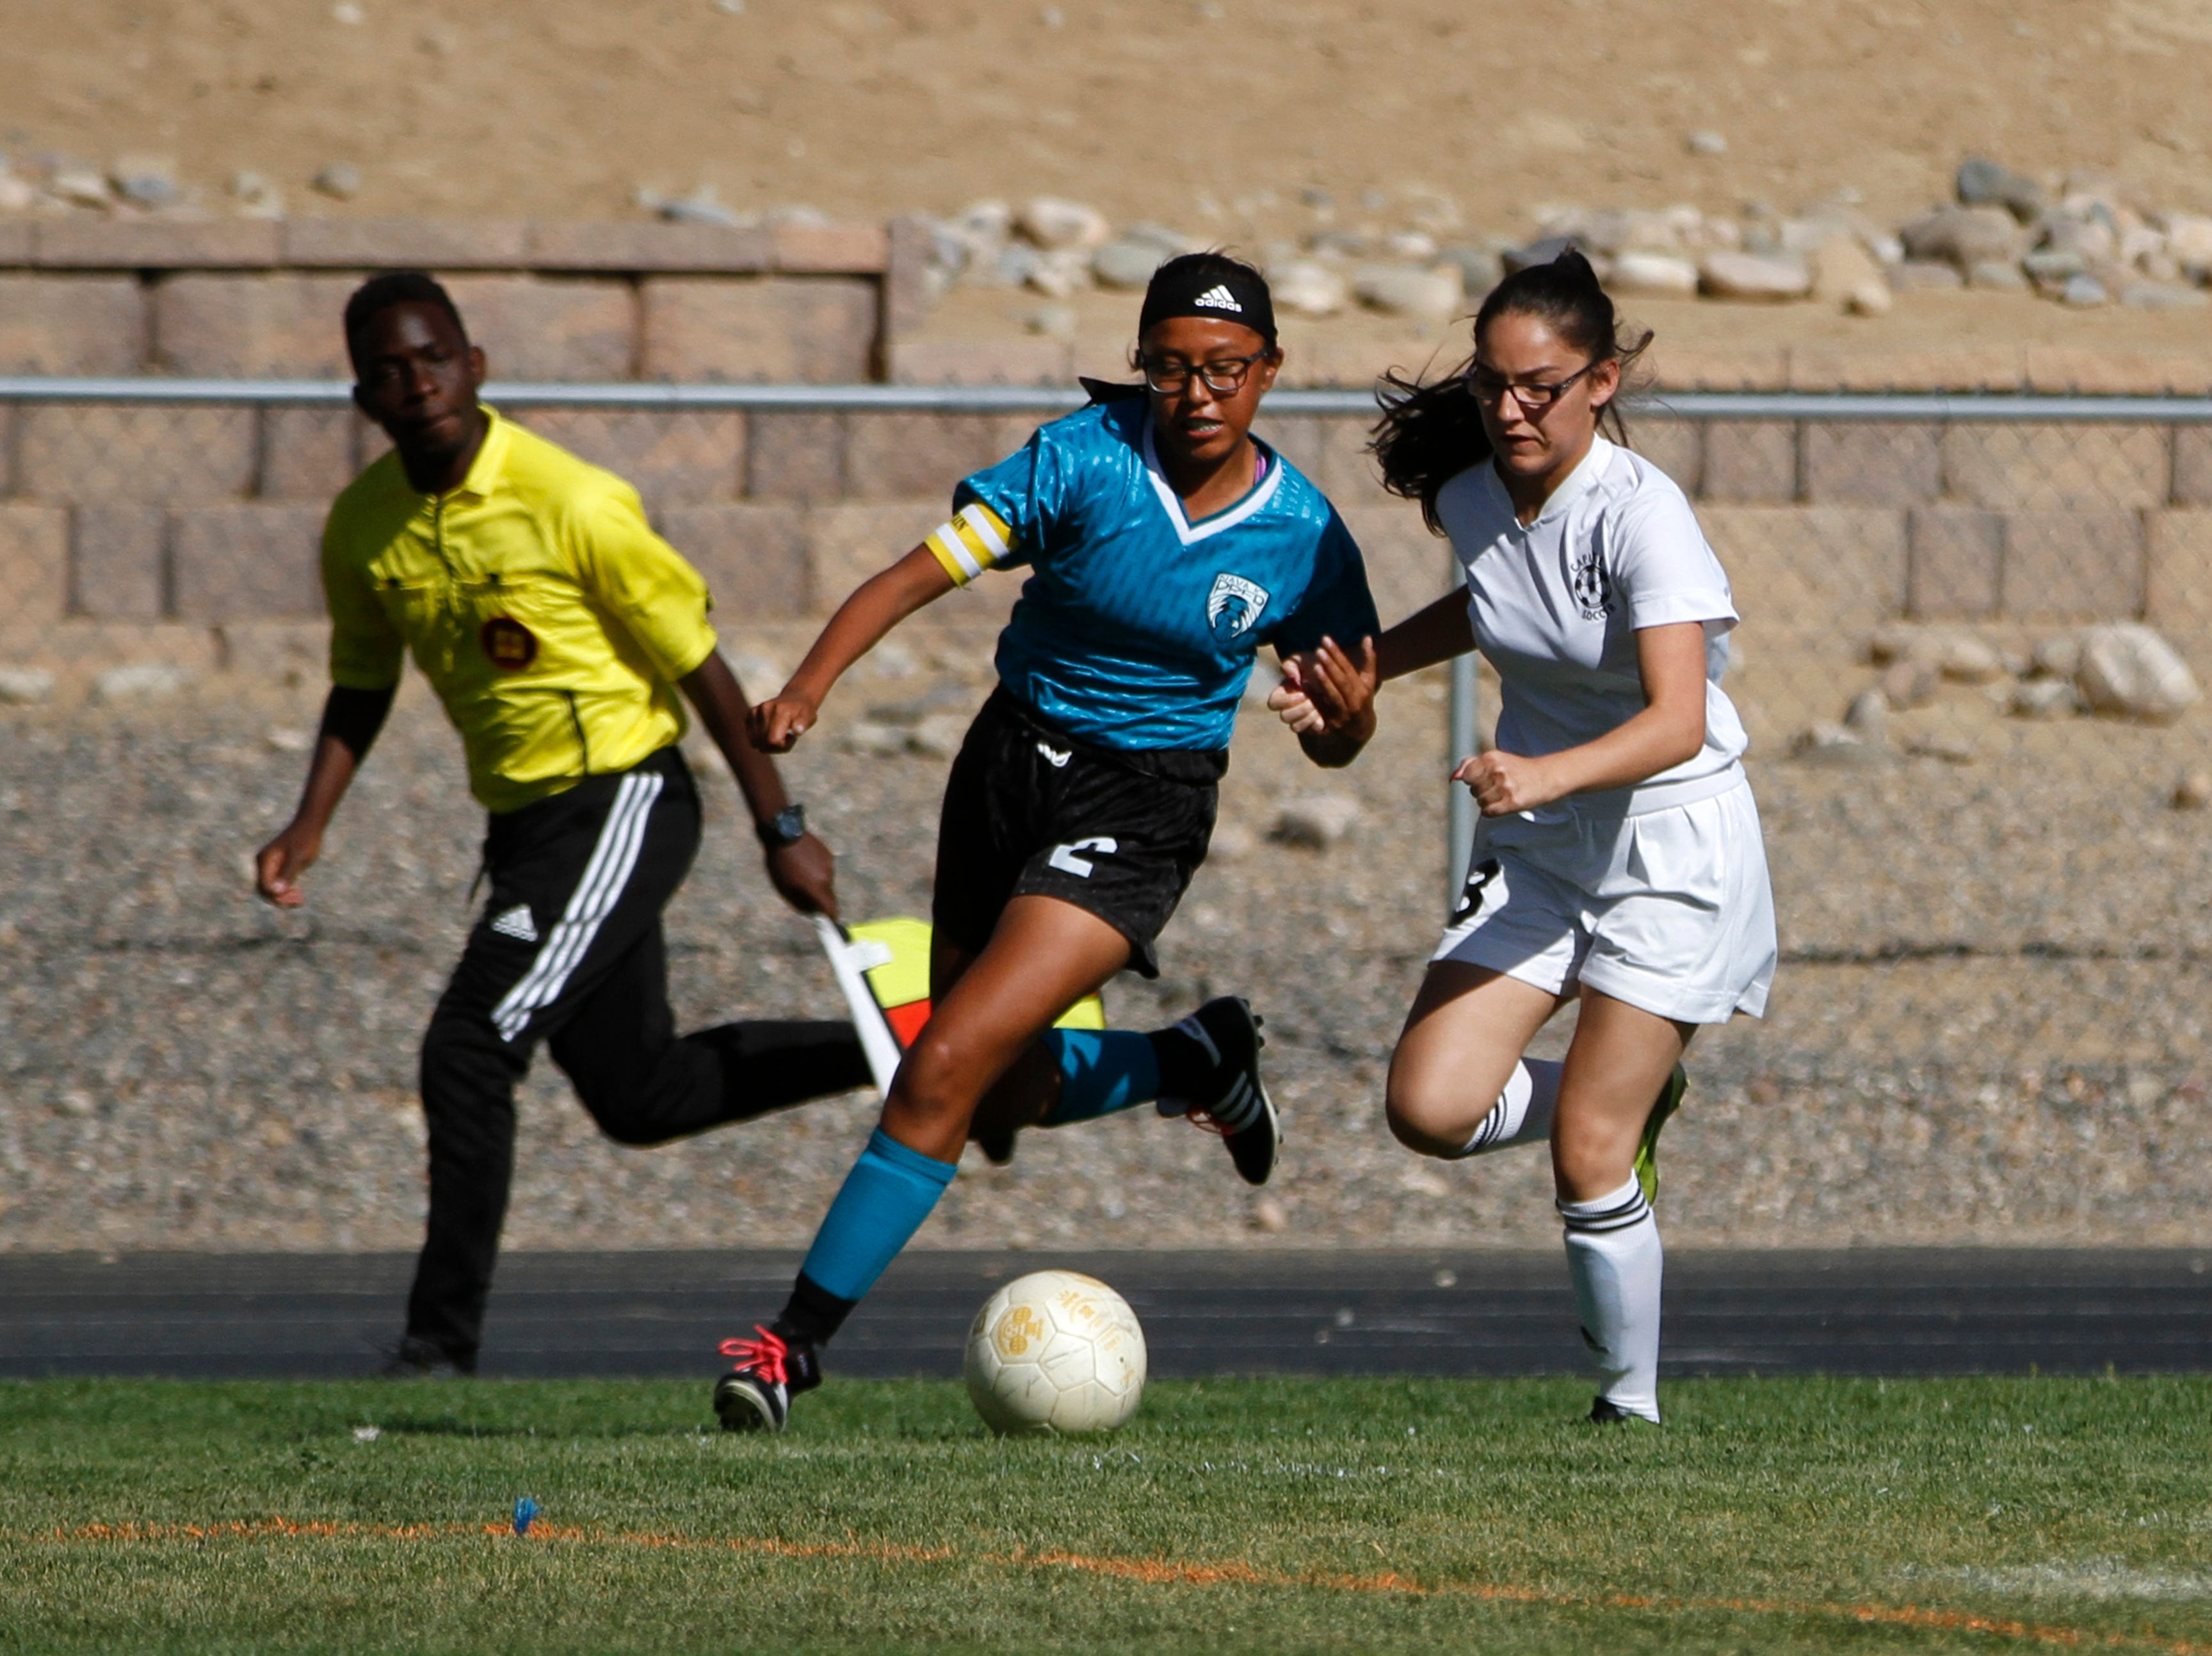 Navajo Prep's Mya Benally tales control of the ball from Capital, Tuesday, Sept. 11, 2018 at Eagle Stadium in Farmington.